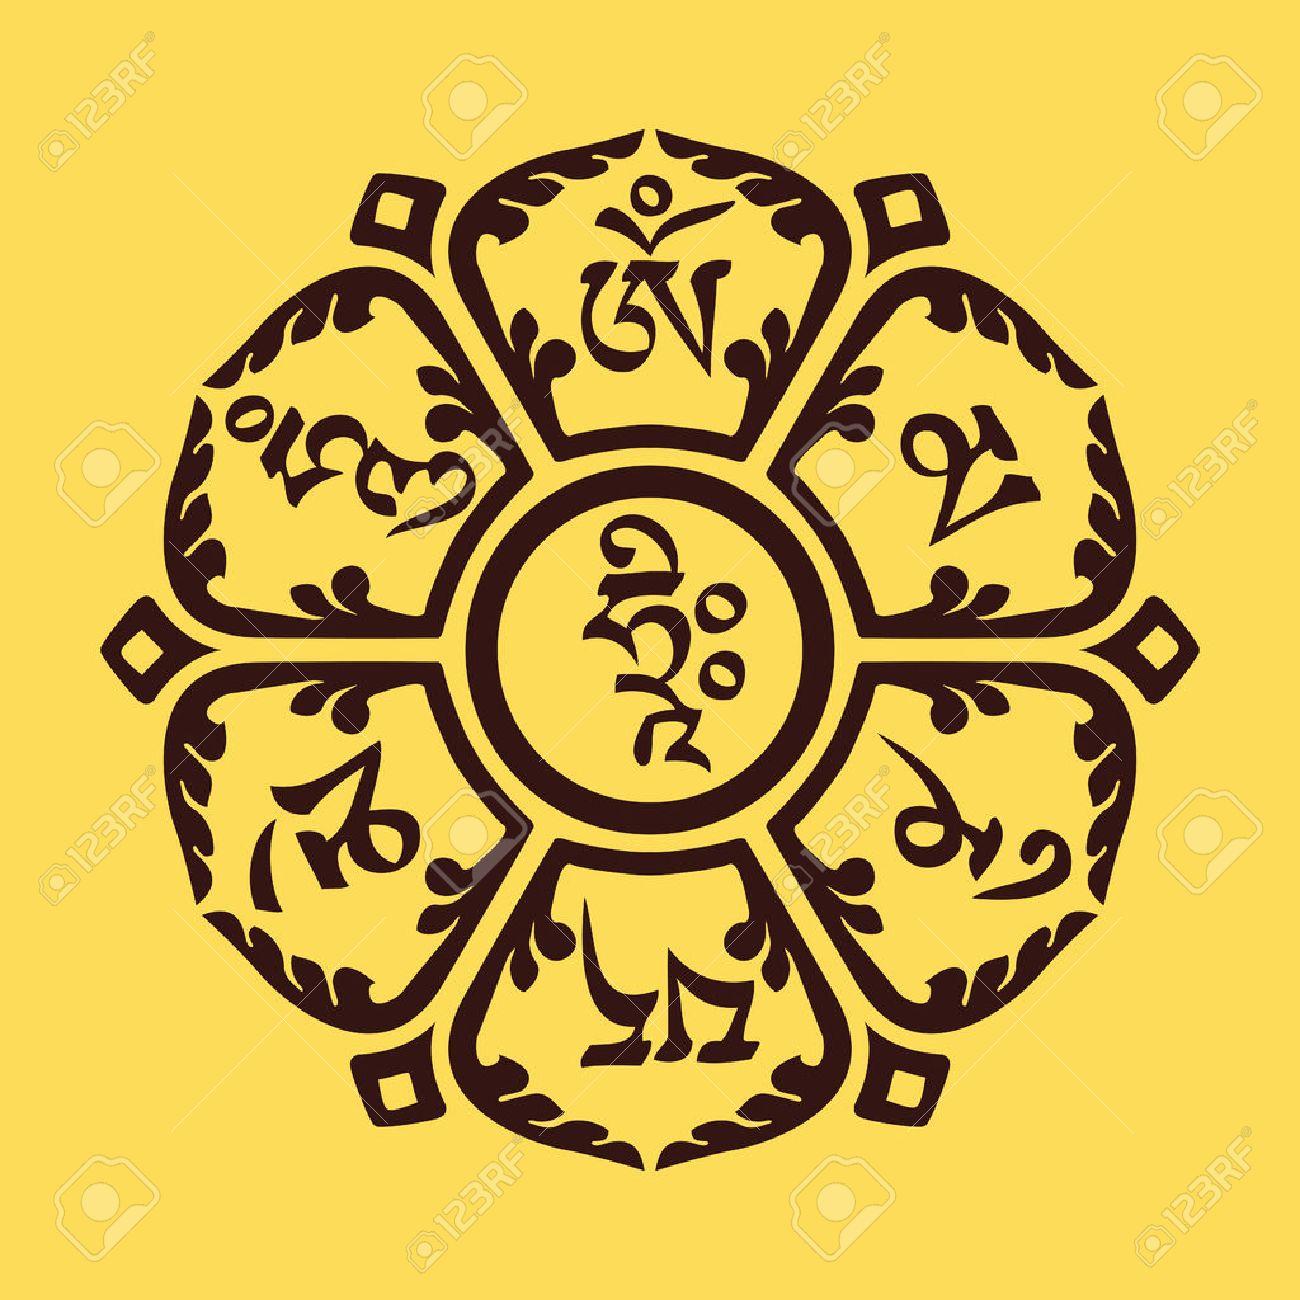 om mani padme hum mantra flower - 46998675